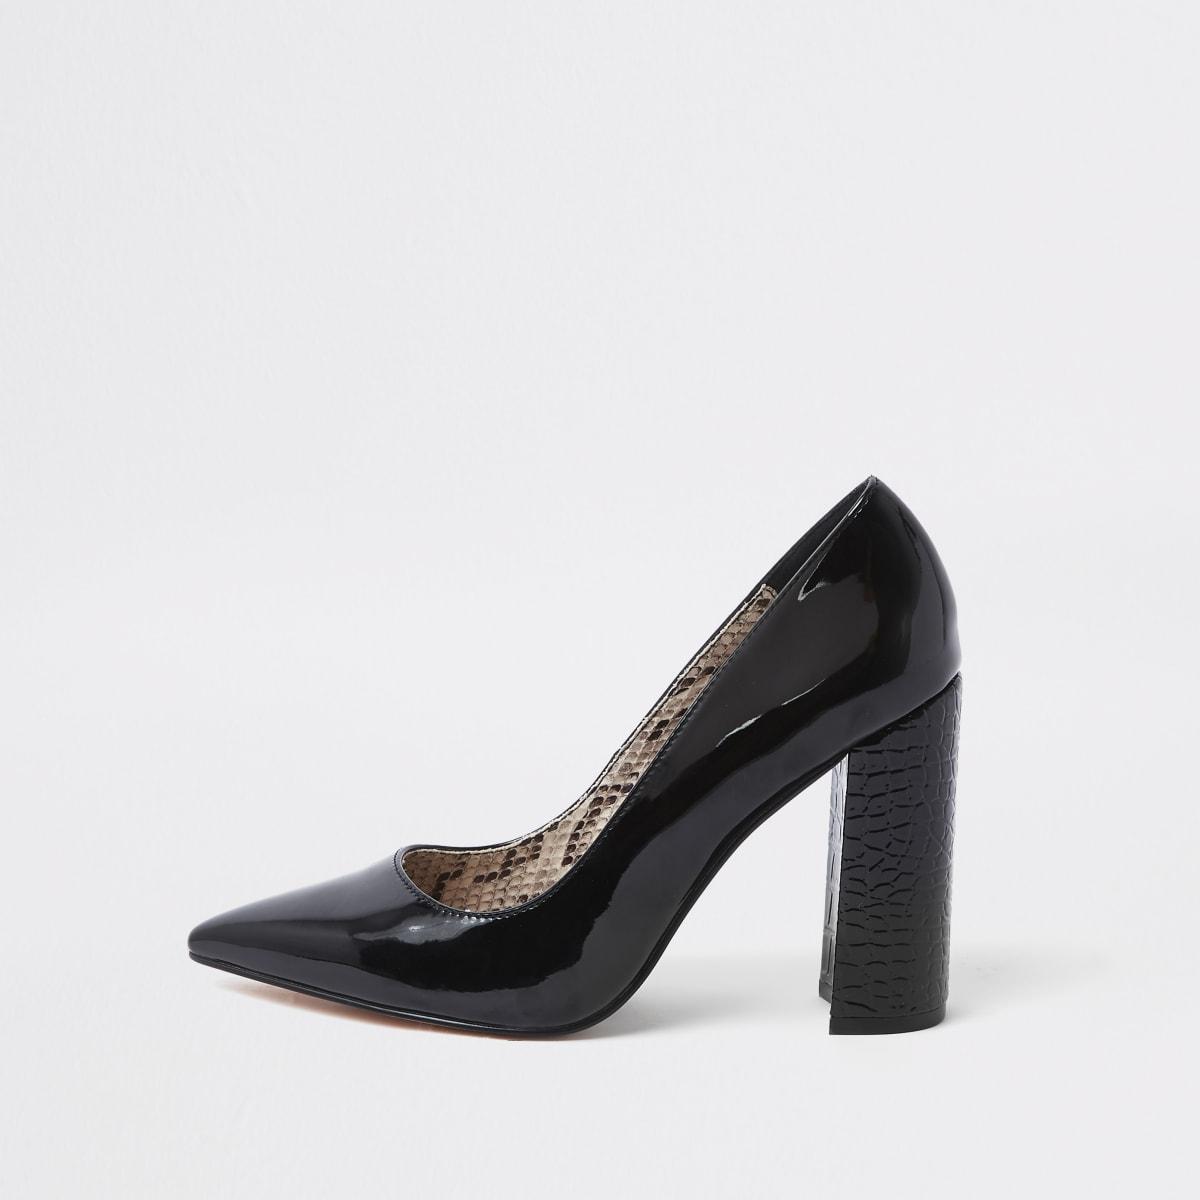 Black wrap around block heel court shoes